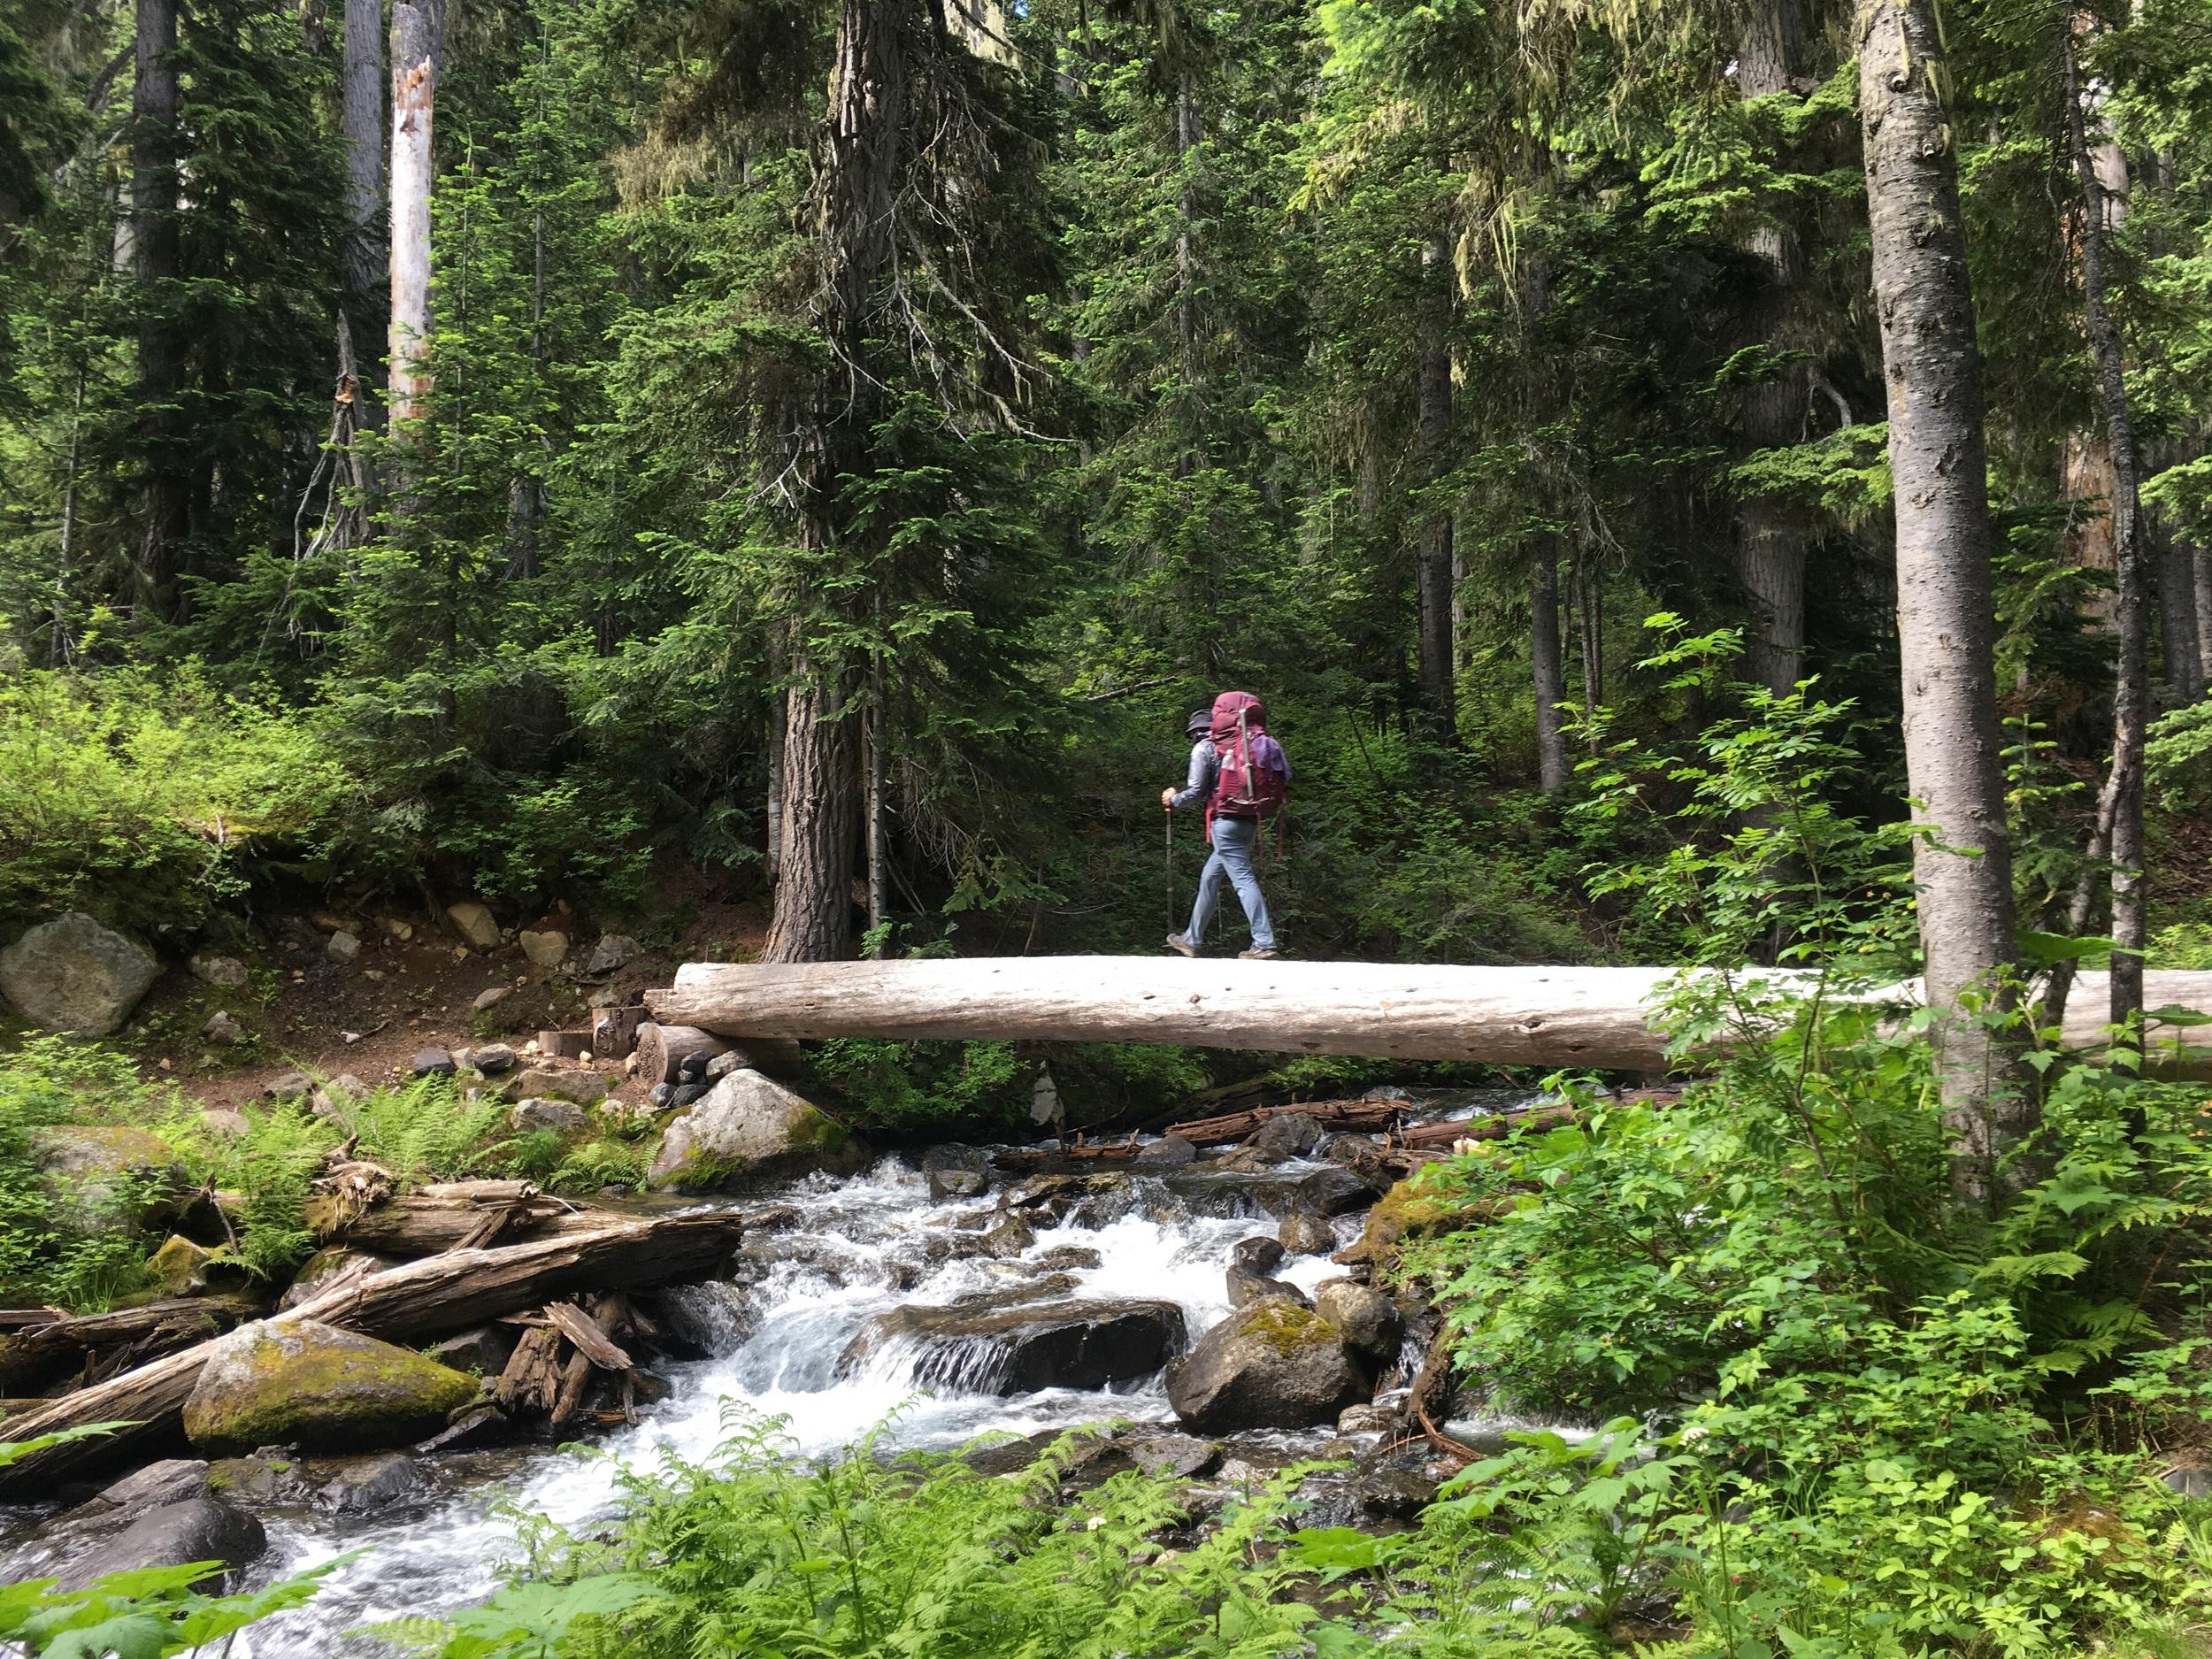 Crossing a log foot bridge.